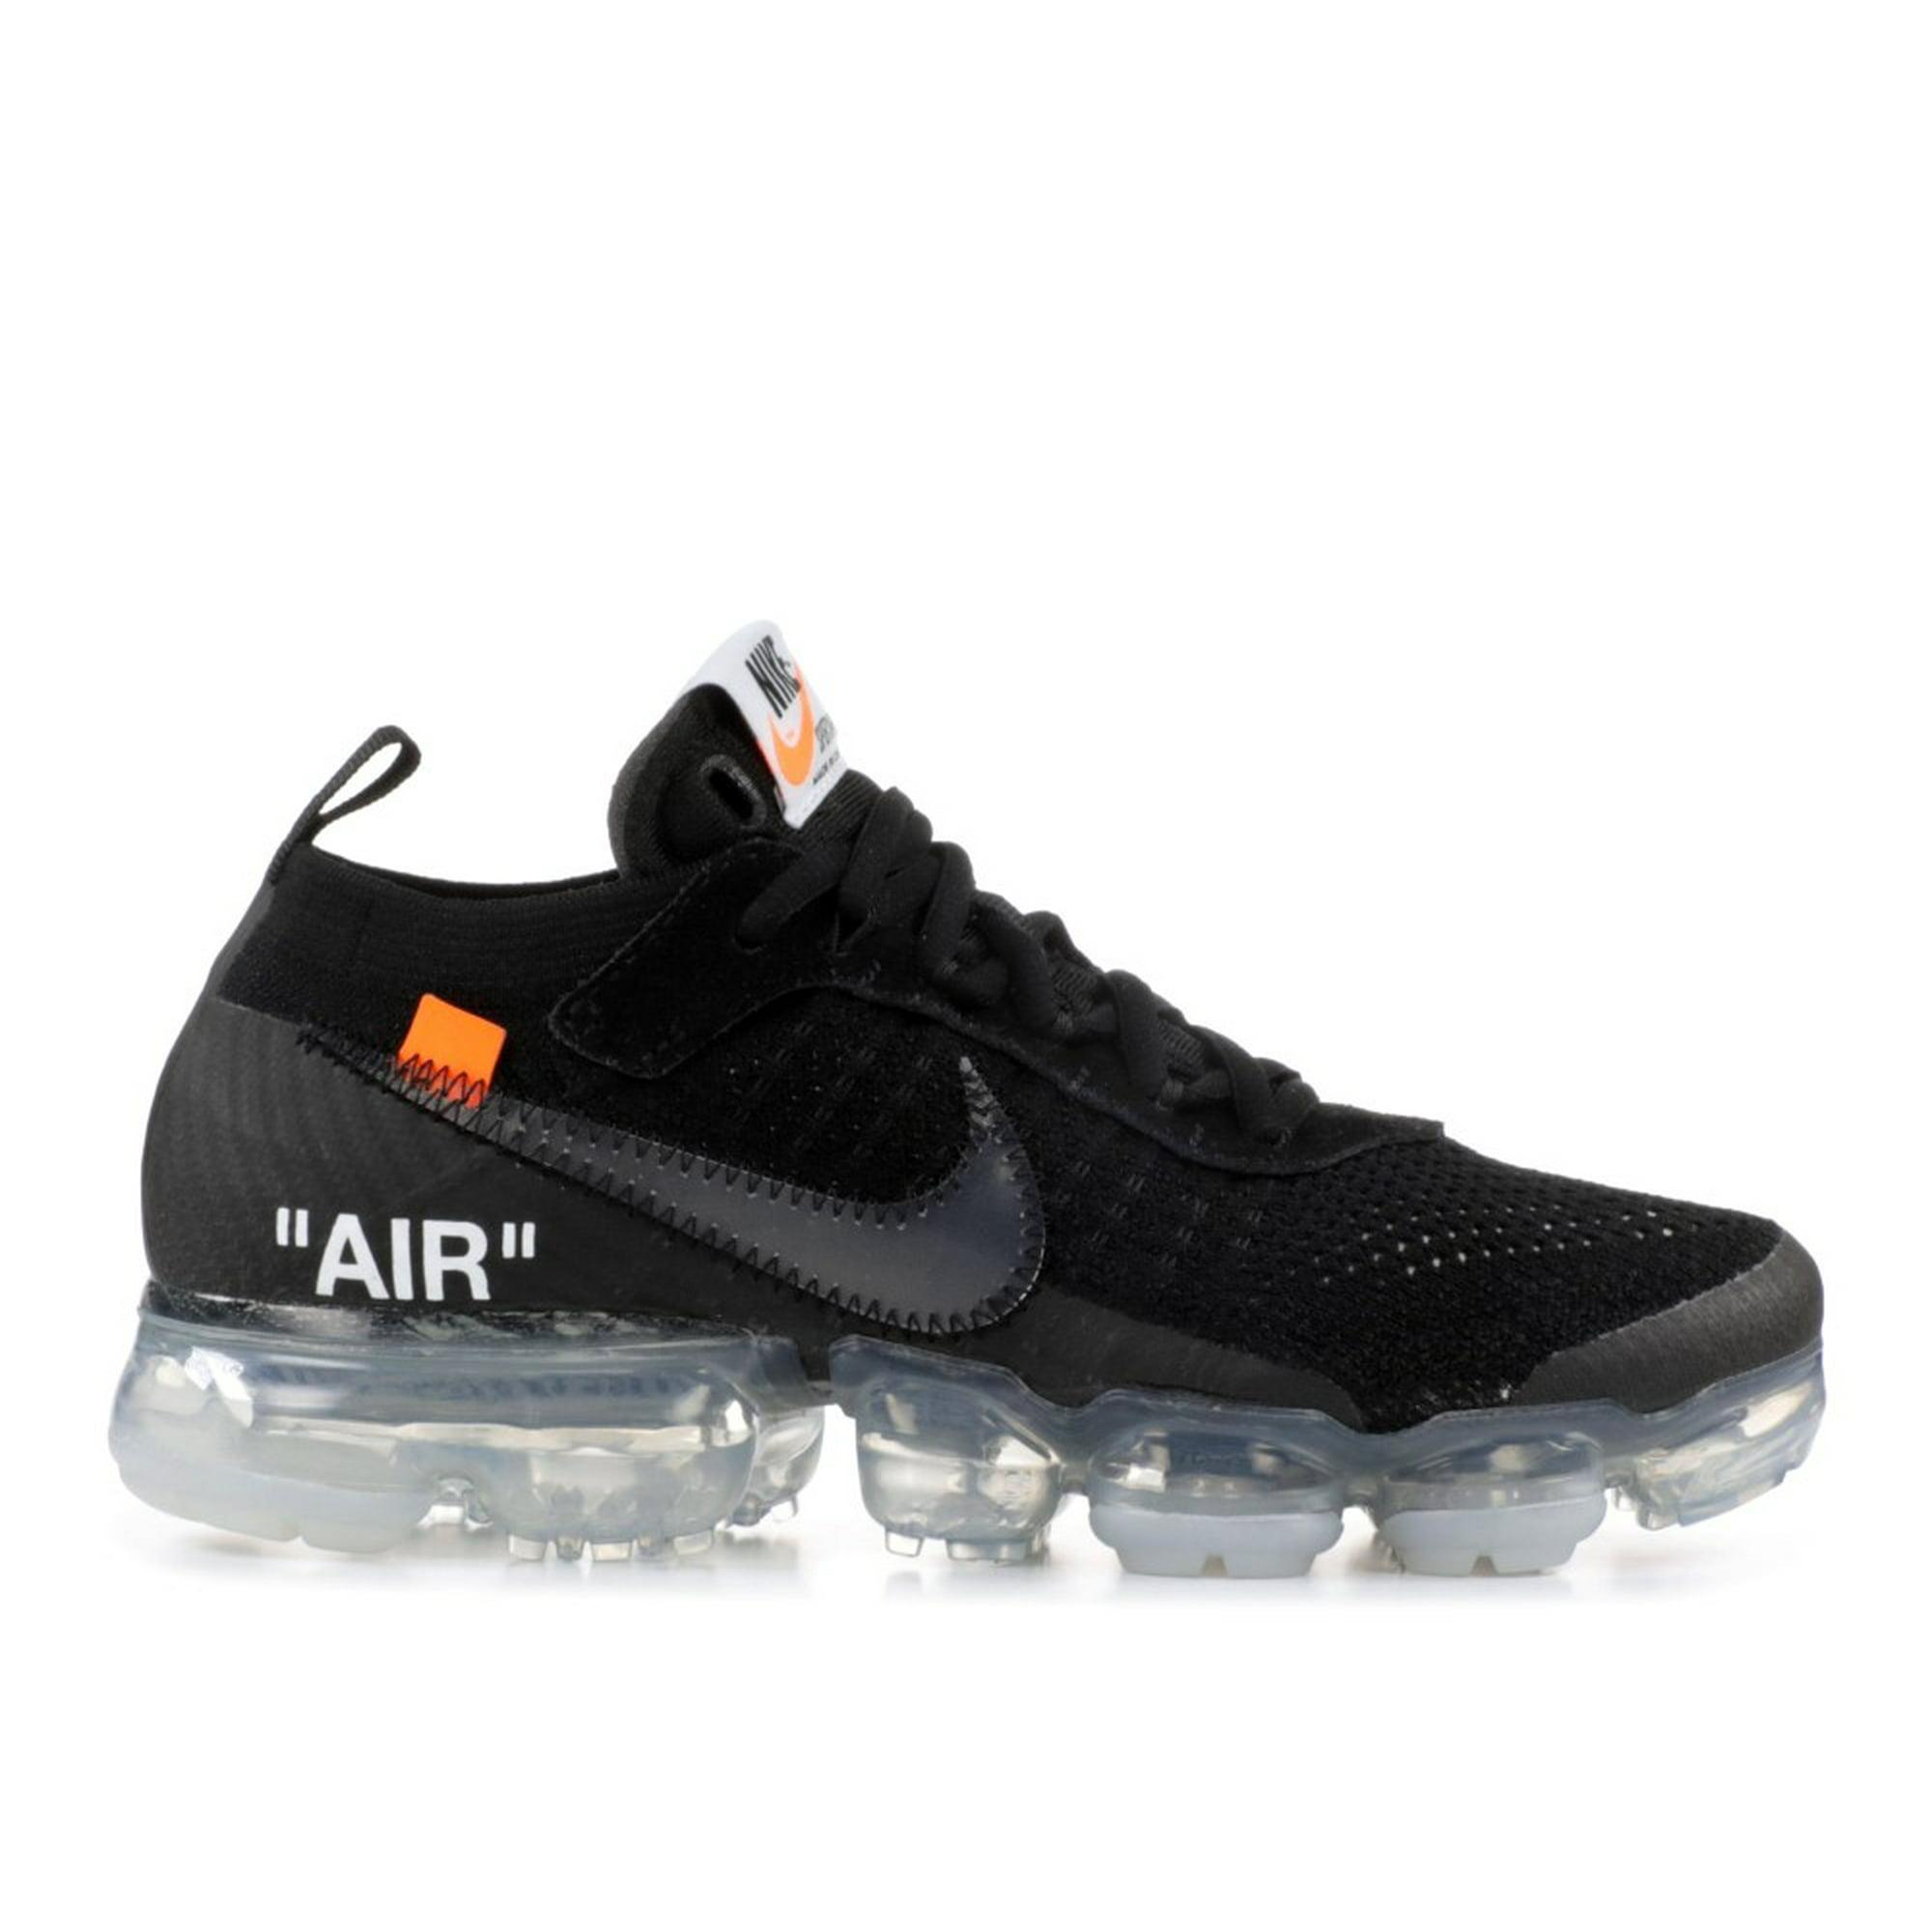 871dee55ebc6e Nike - Men - The 10   Nike Air Vapormax Fk  Off-White  - Aa3831-002 - Size  7